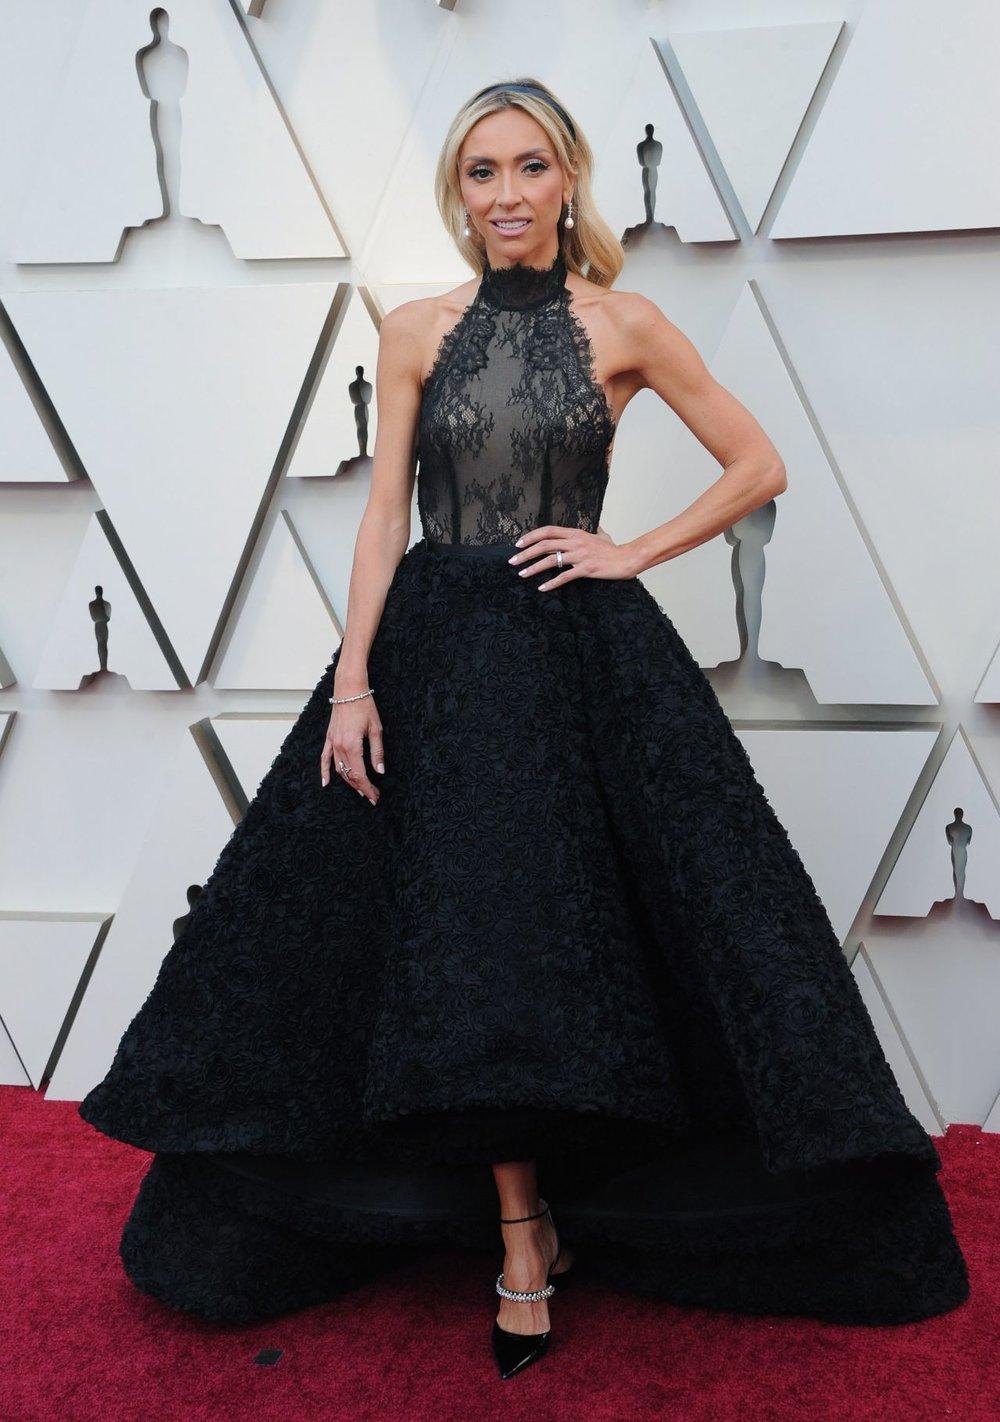 Giuliana Rancic at the Oscars 2019. Photo courtesy of Kelly NG.